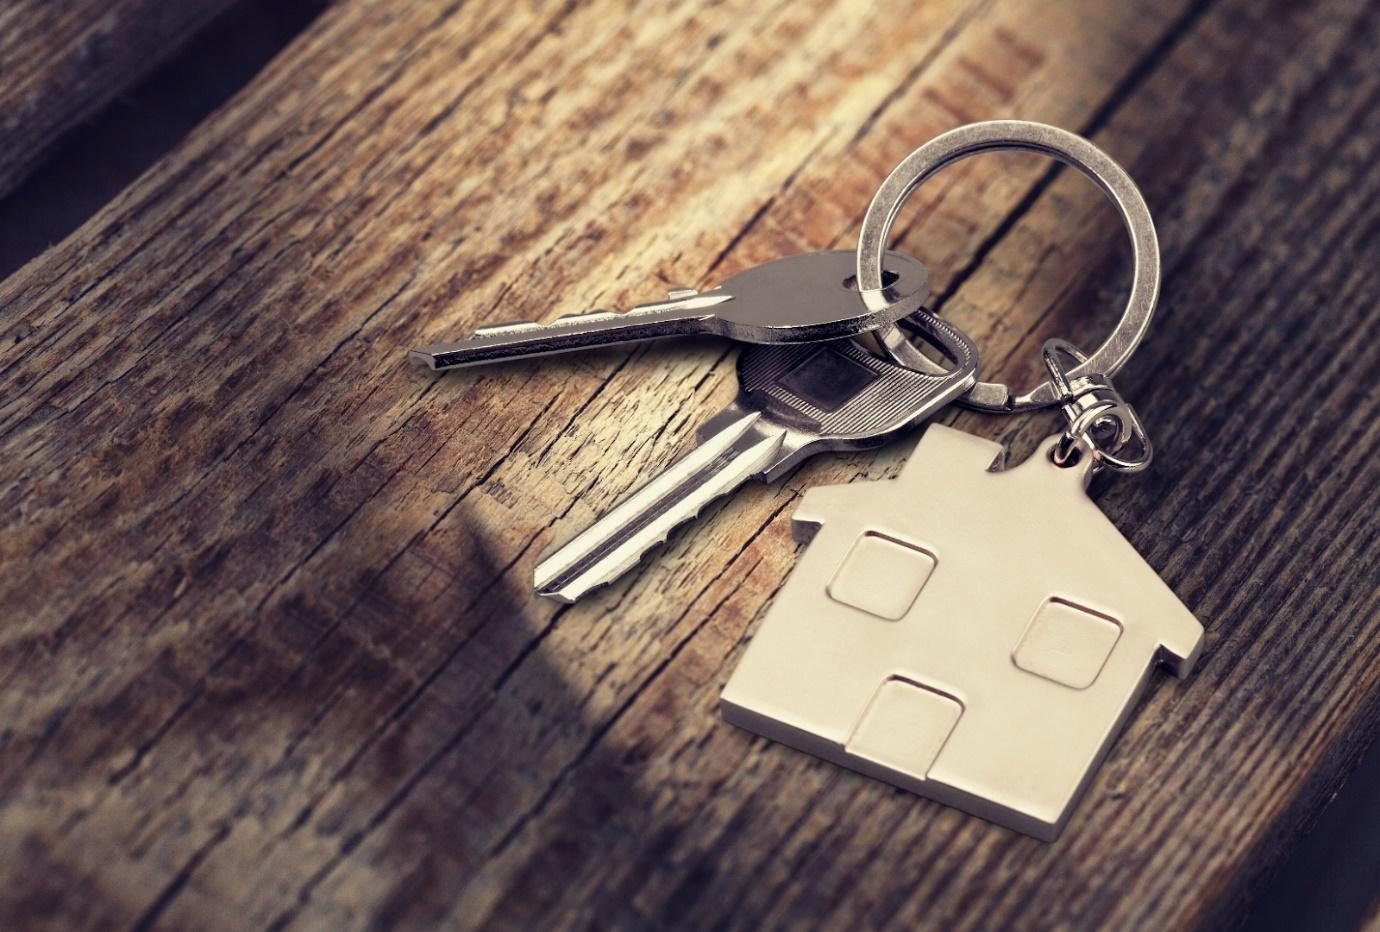 Keys representing a landlord